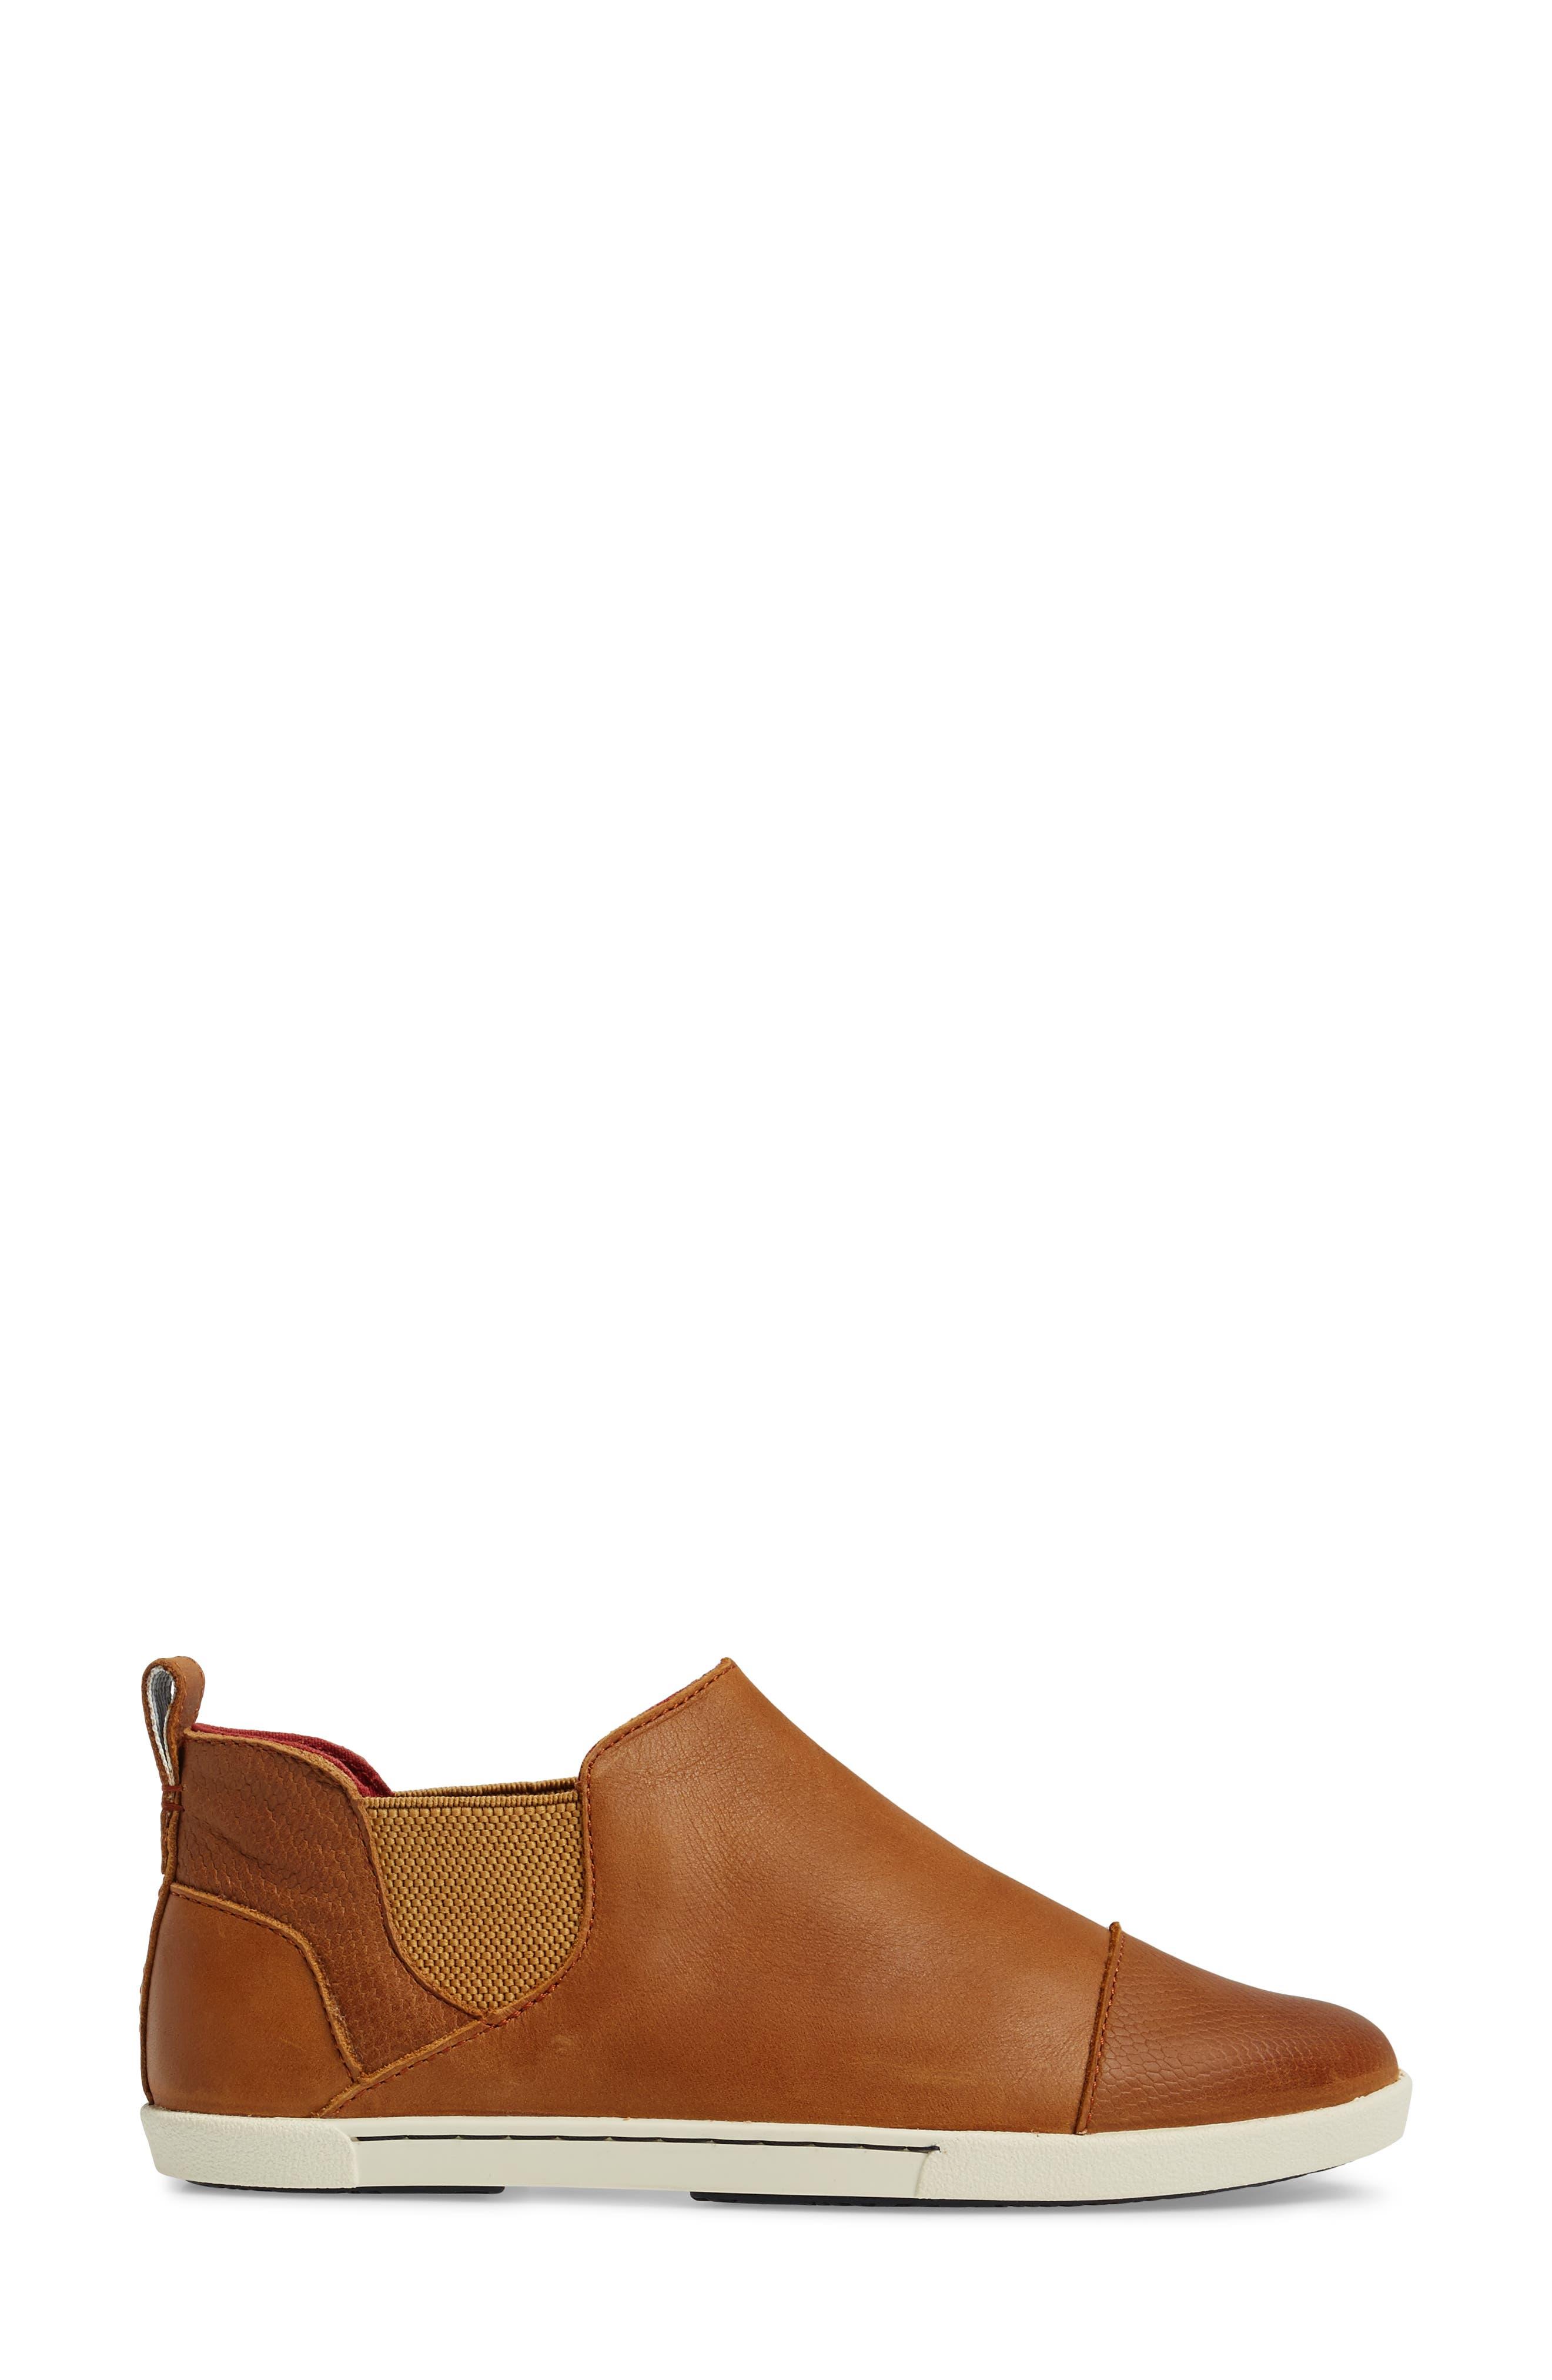 Alternate Image 3  - OluKai Waipahe Chelsea Sneaker (Women)